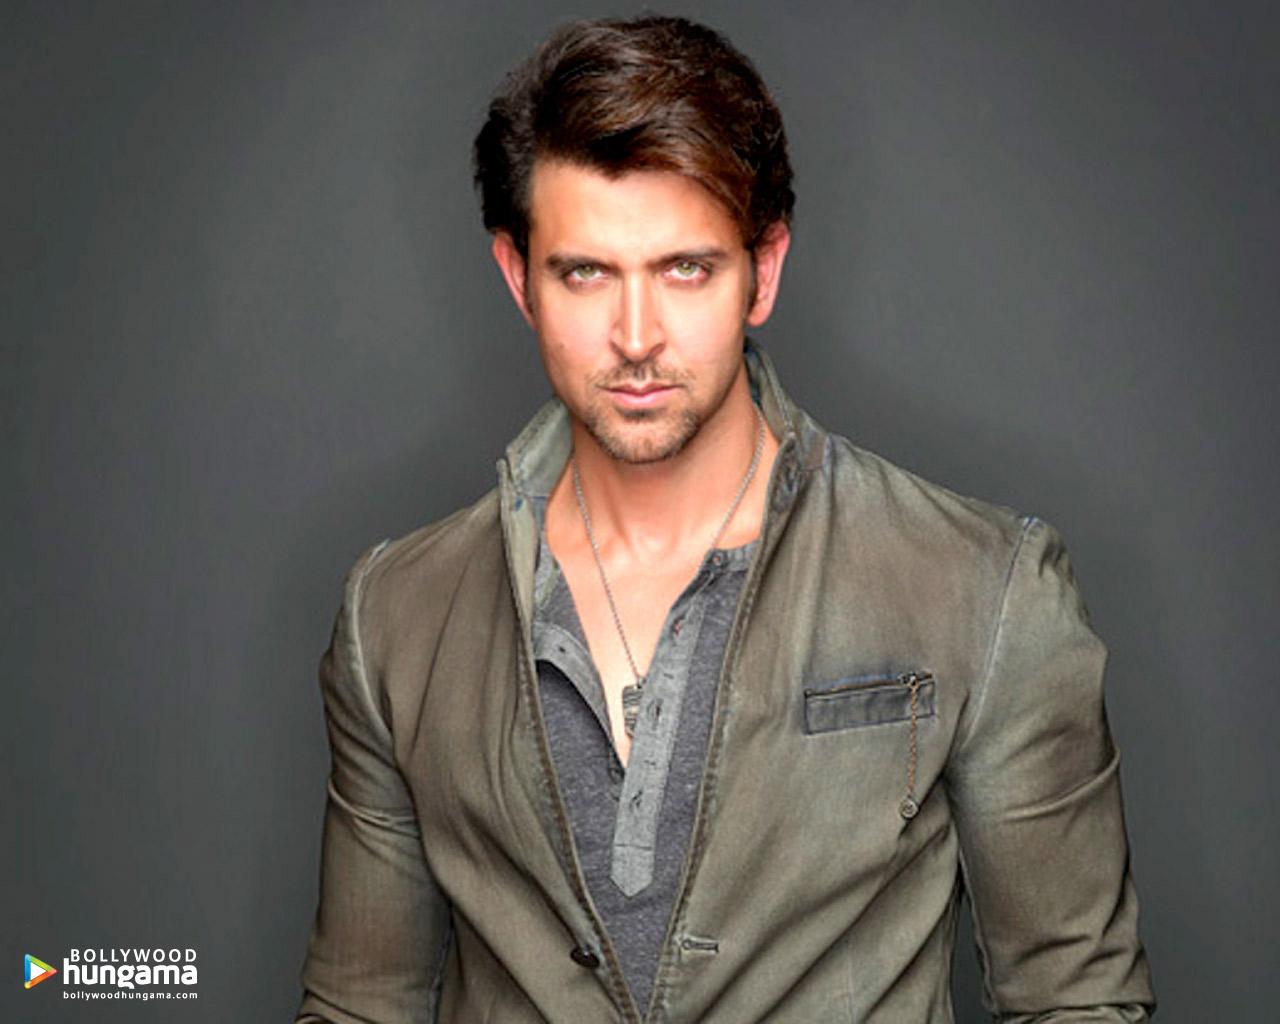 Hrithik Roshan Wallpapers | hrithik-roshan-1-4 - Bollywood ...